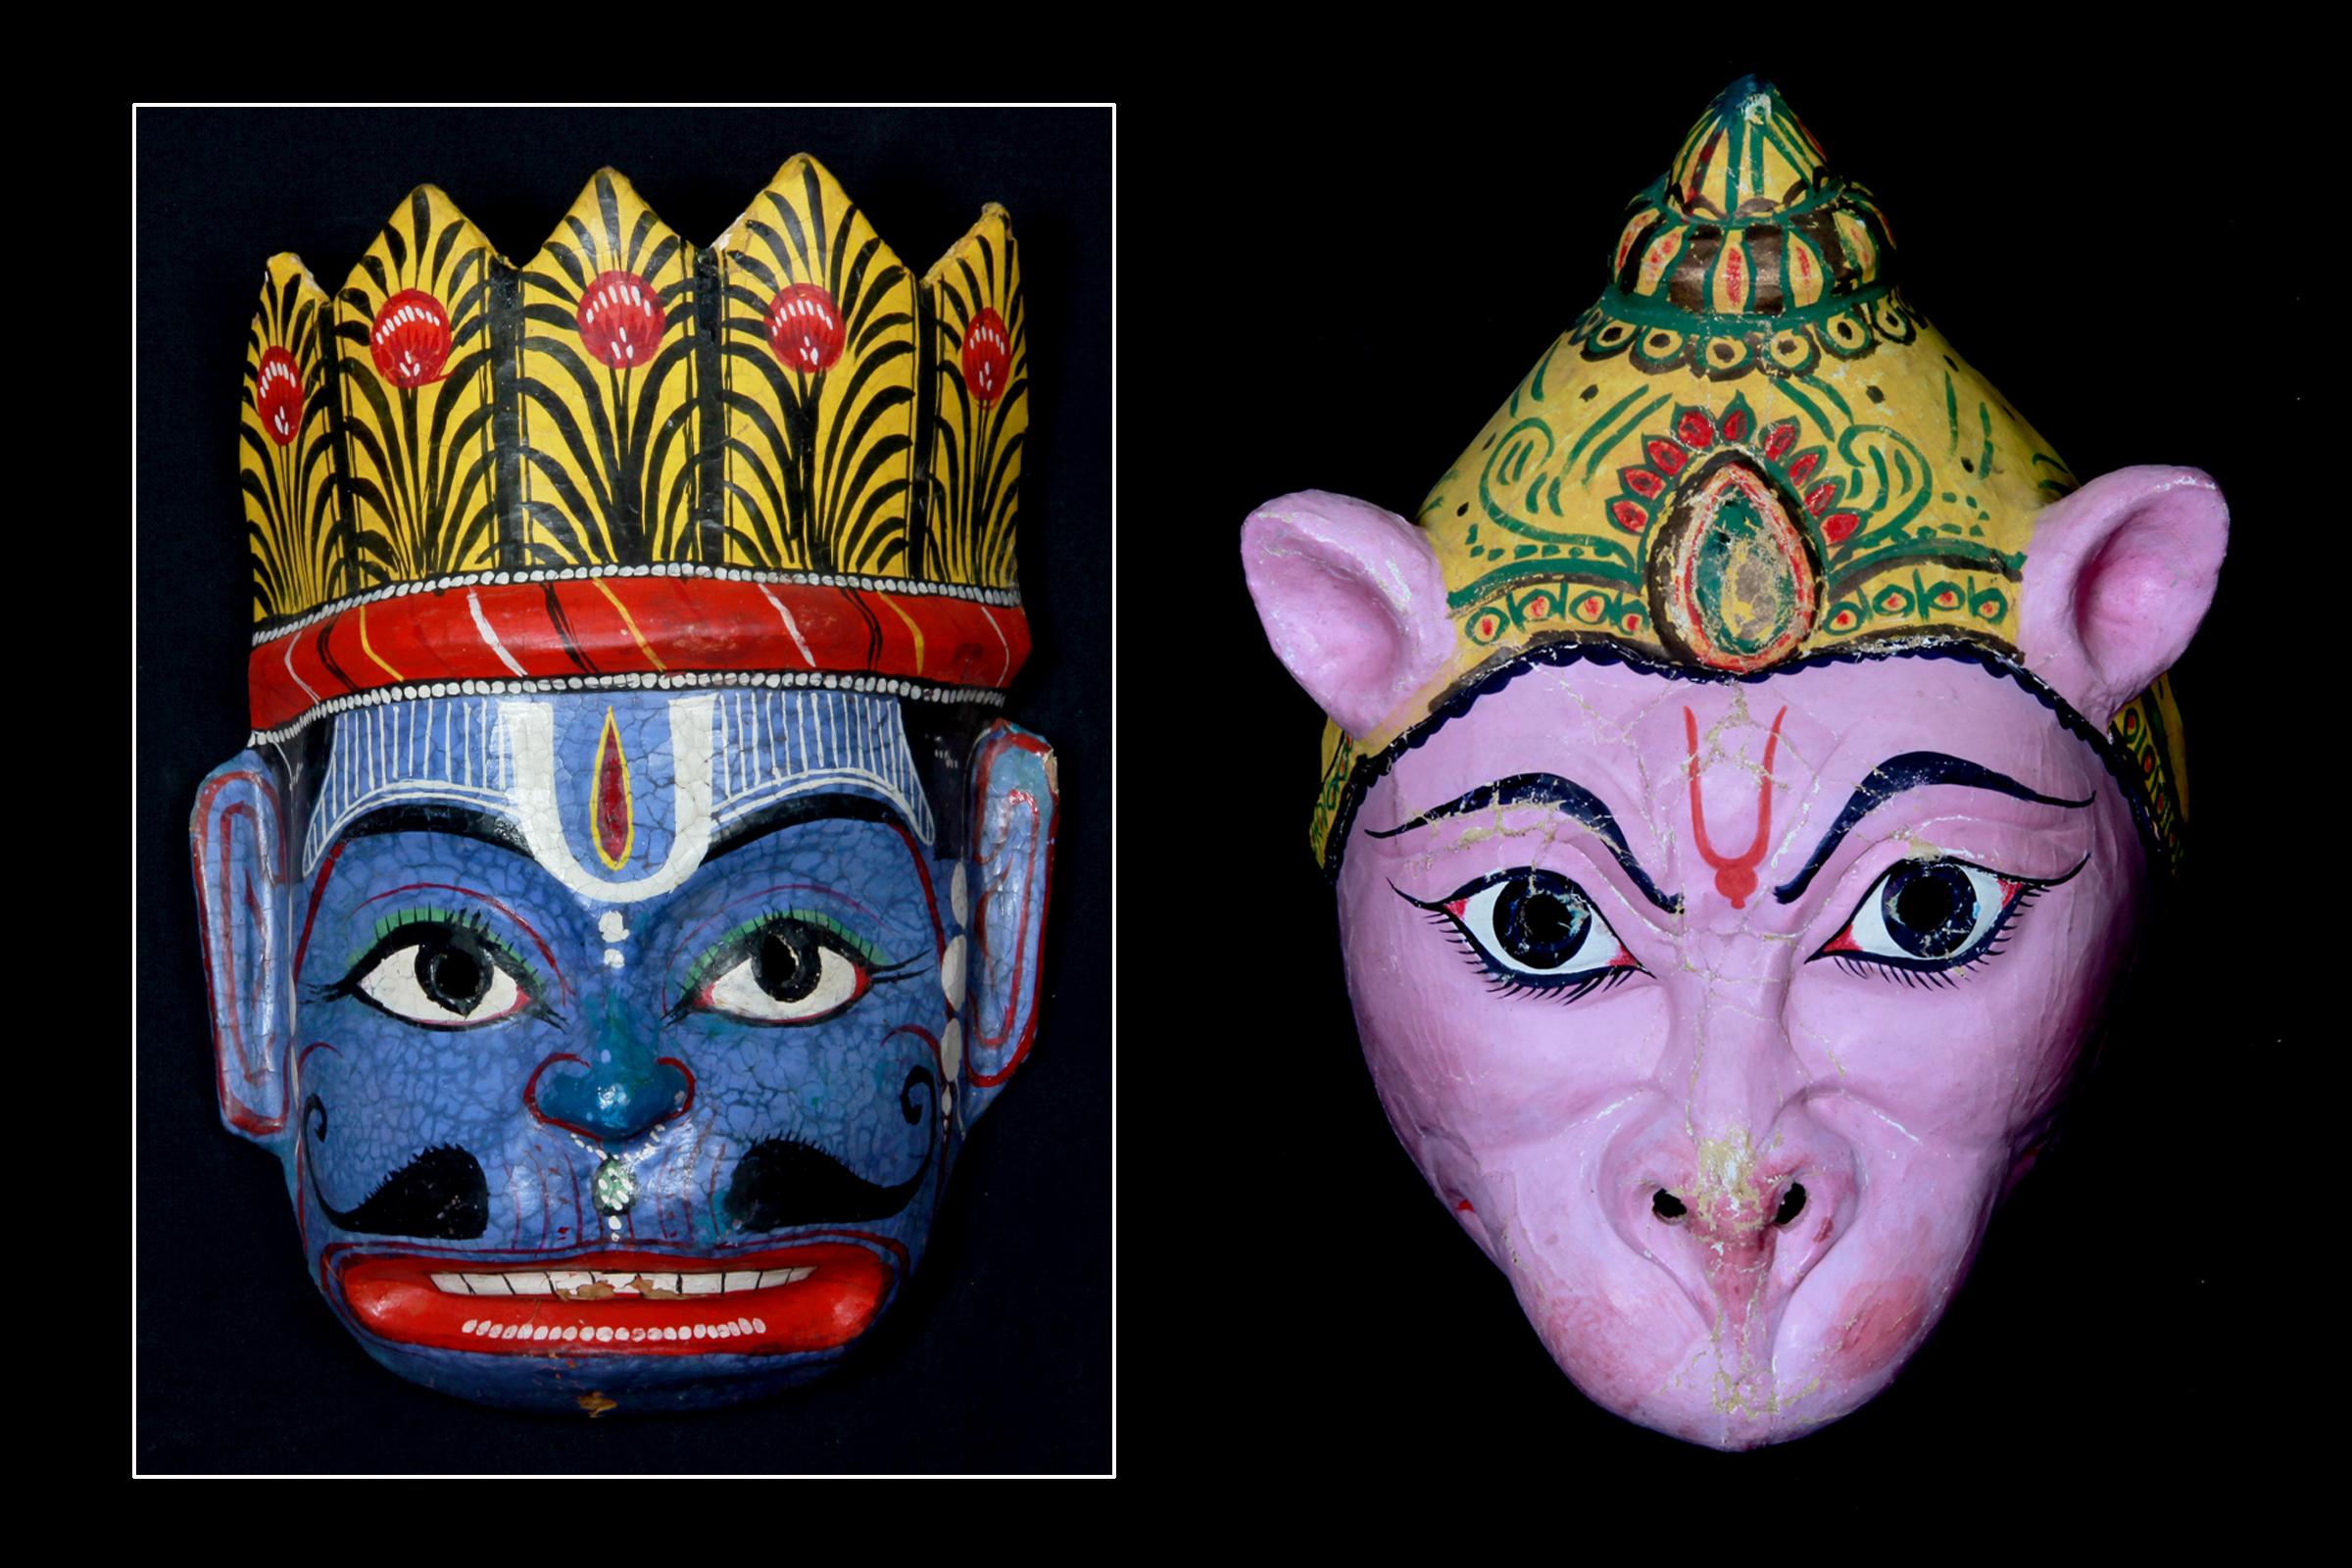 Fotos de dos máscaras de la exposición Akhyan